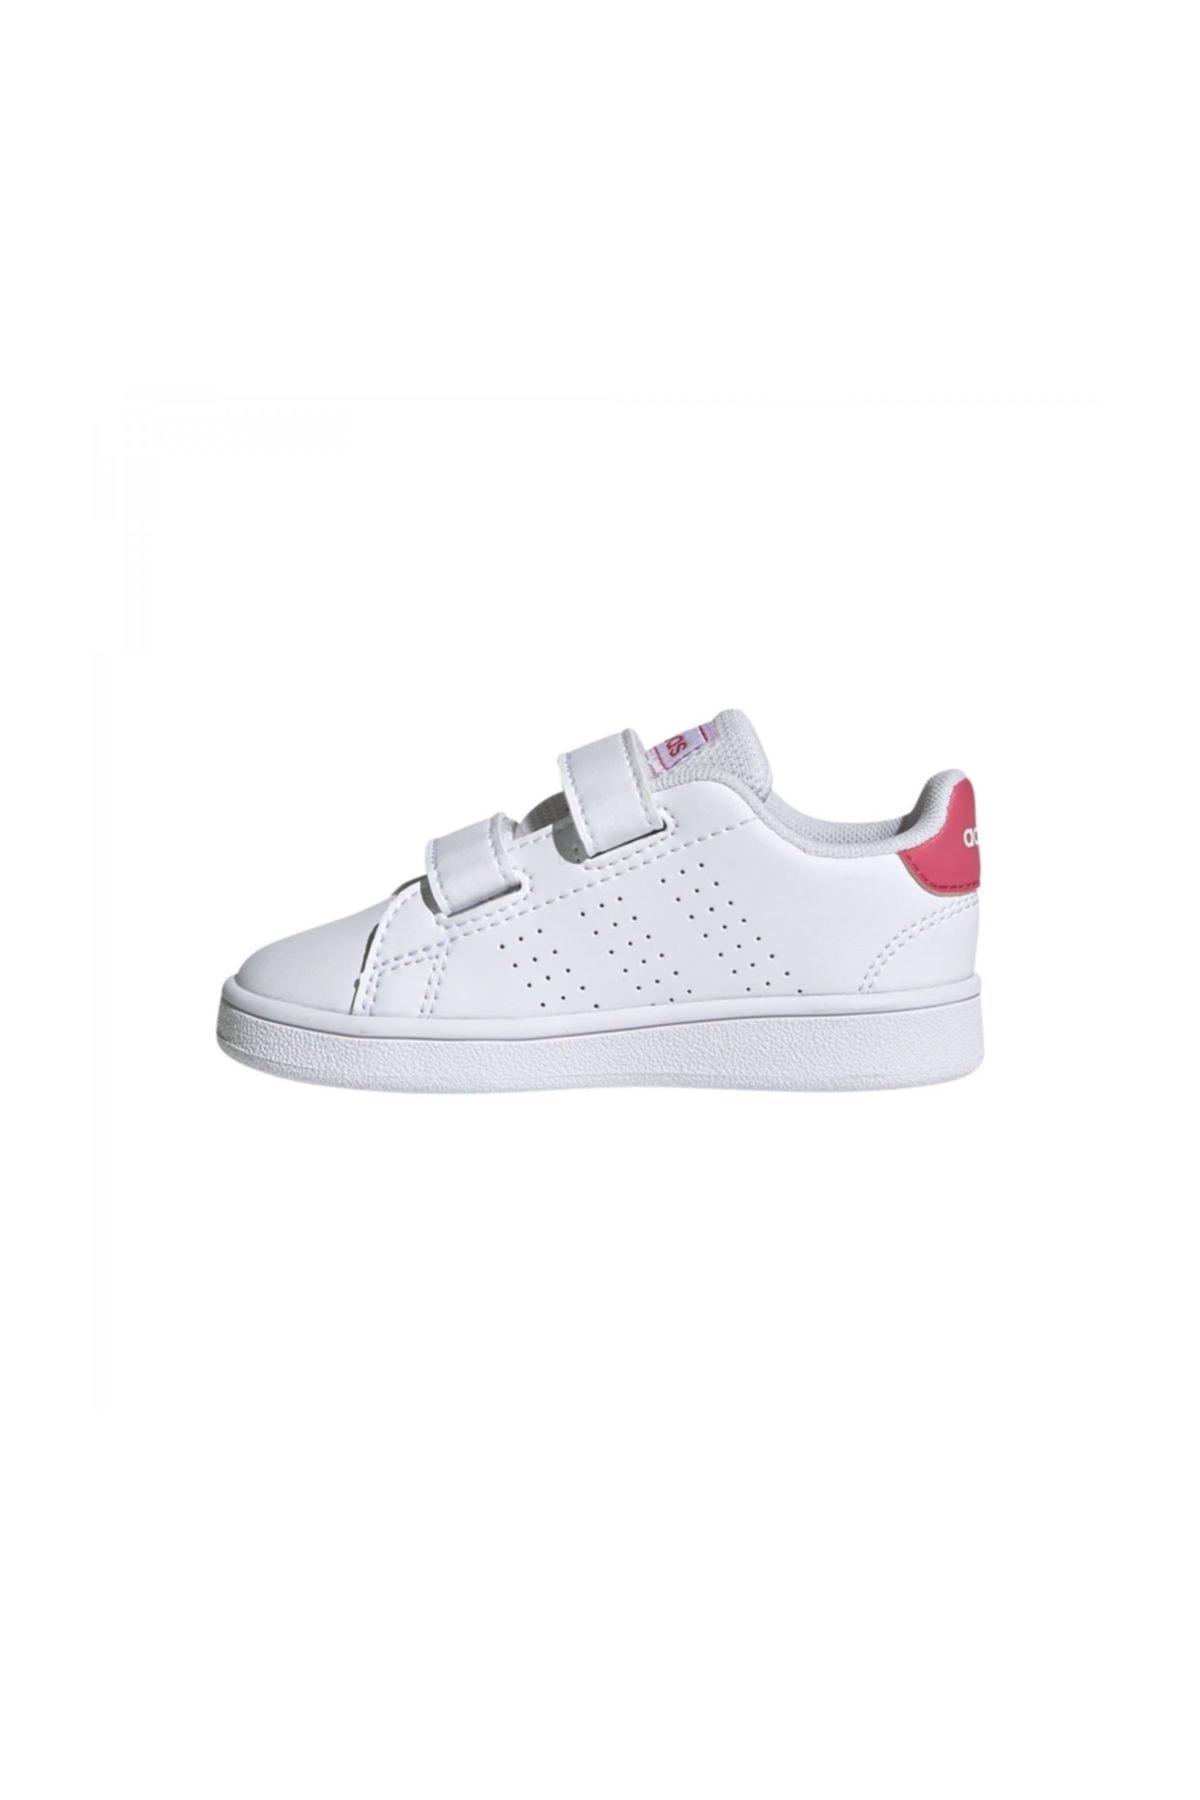 adidas ADVANTAGE Pembe Kız Çocuk Sneaker Ayakkabı 100536371 2